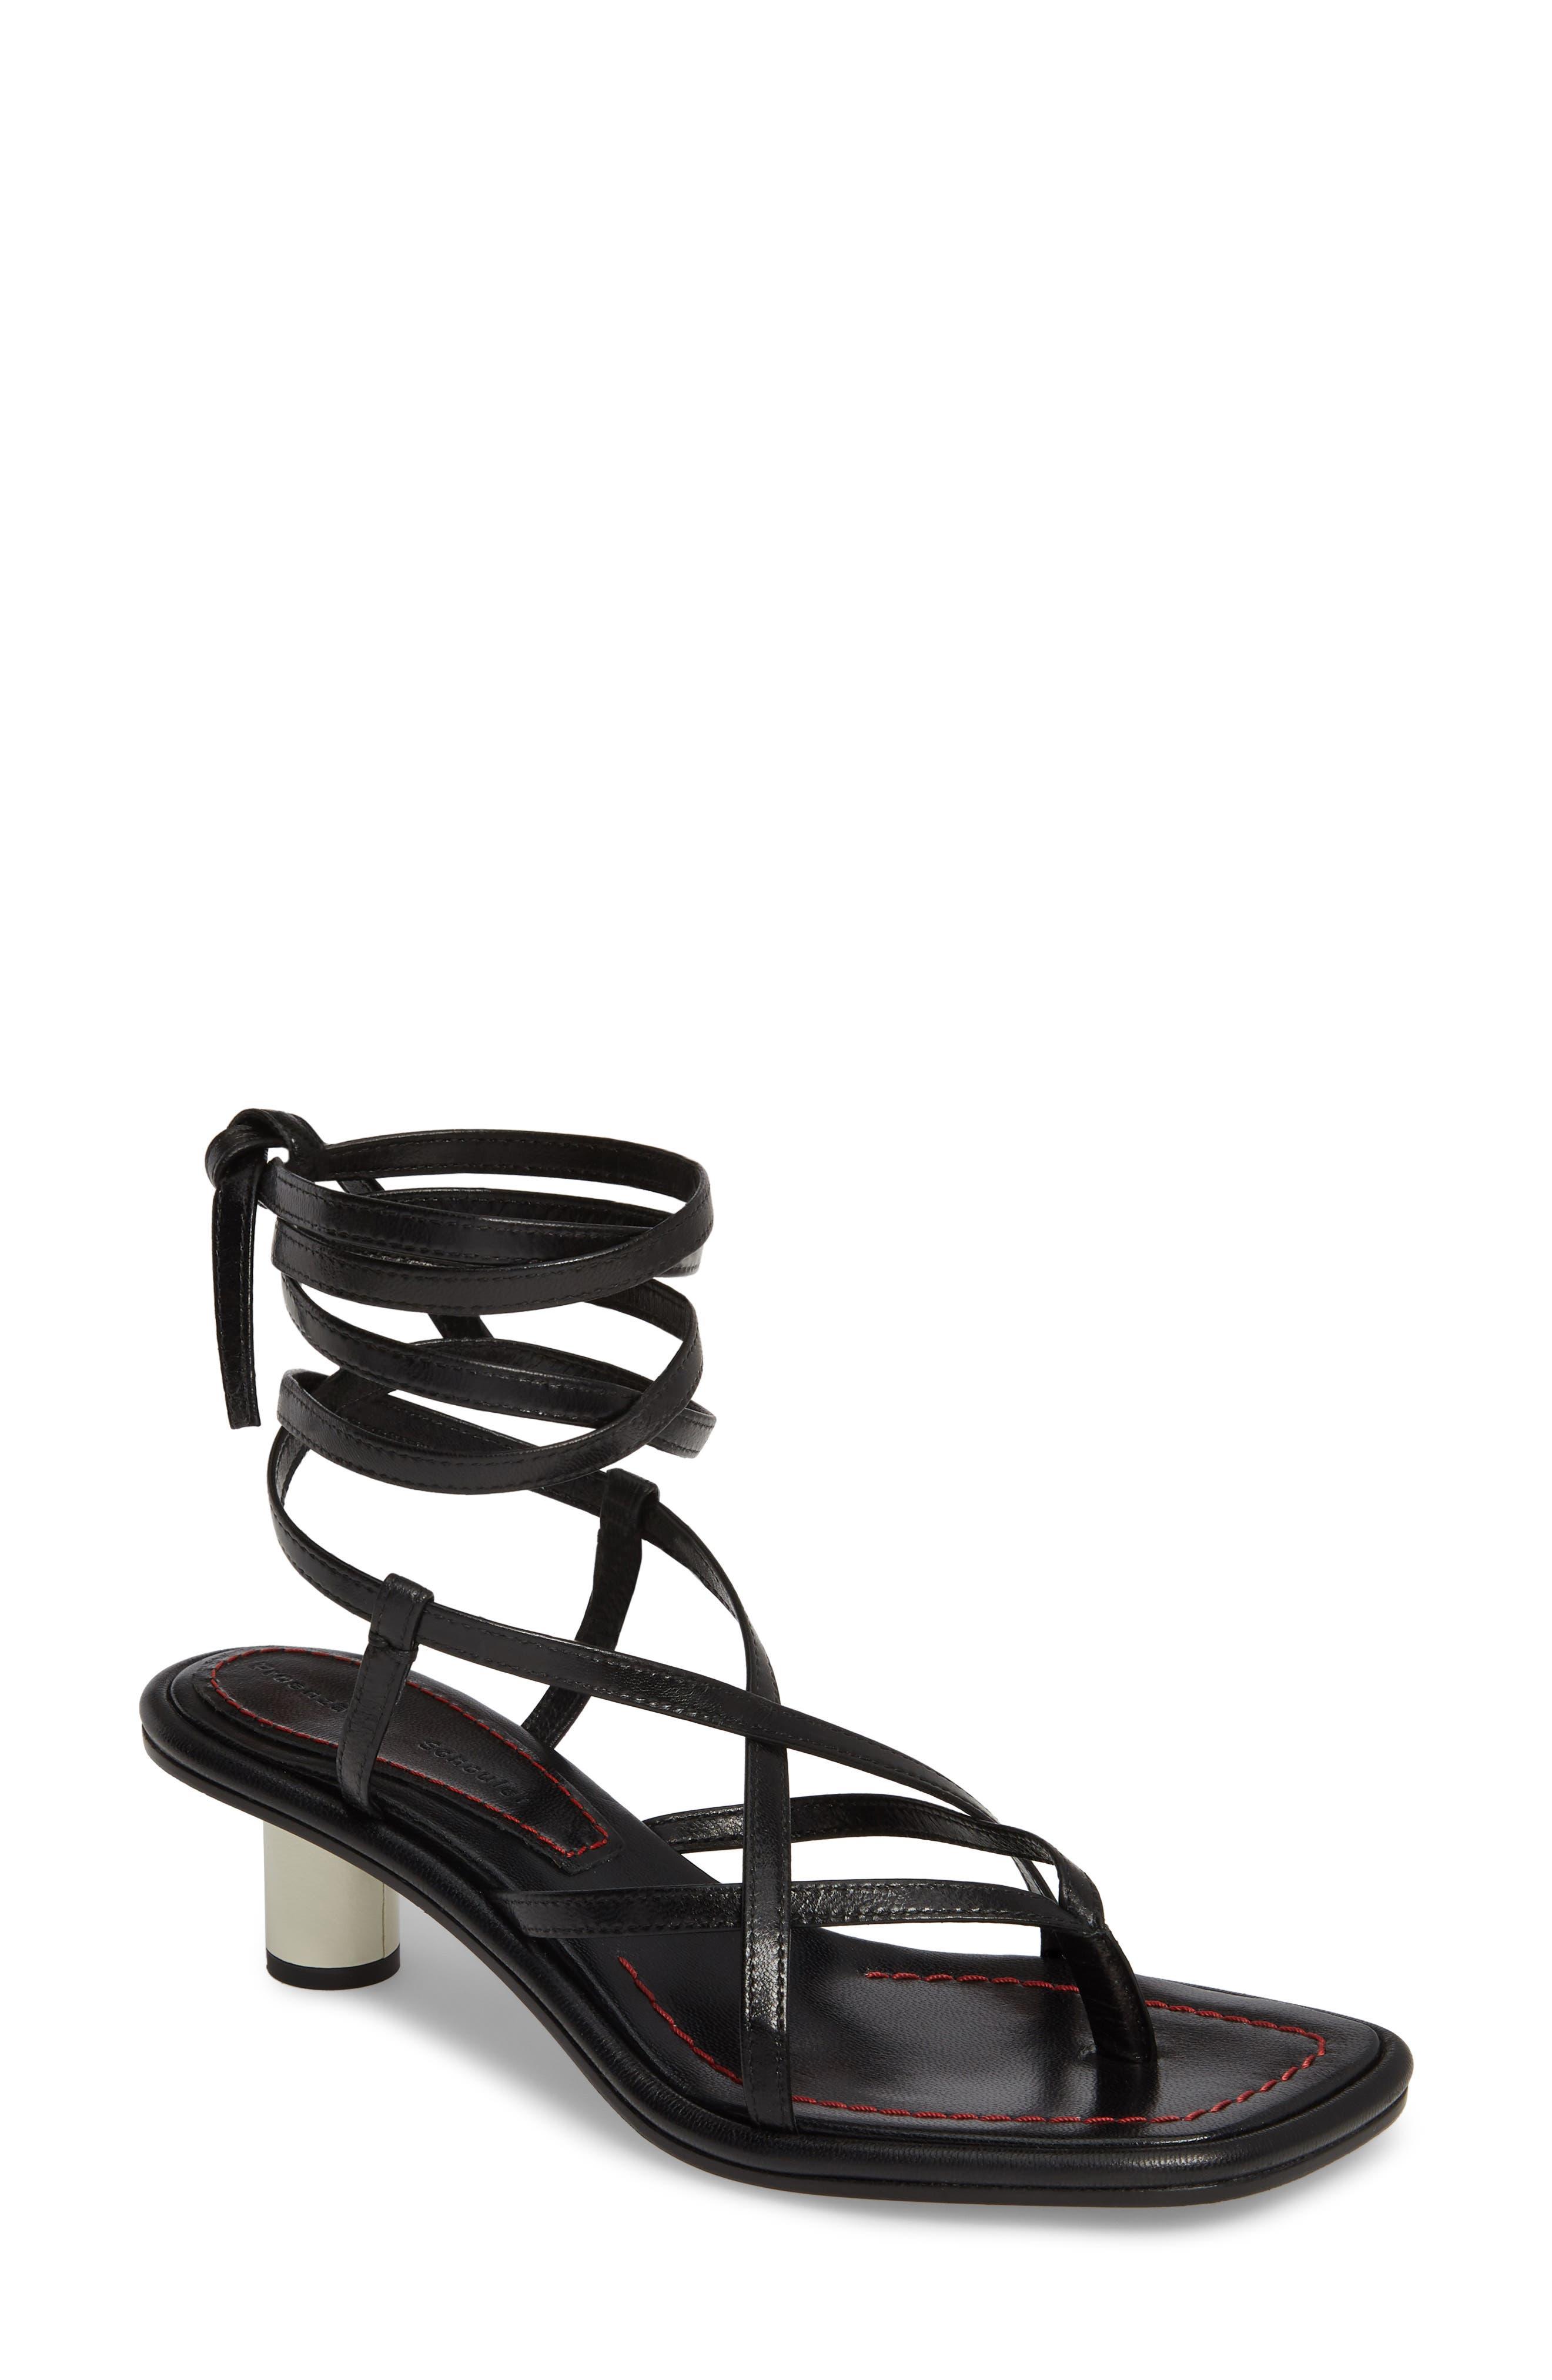 Wraparound Ankle Strap Sandal,                             Main thumbnail 1, color,                             BLACK